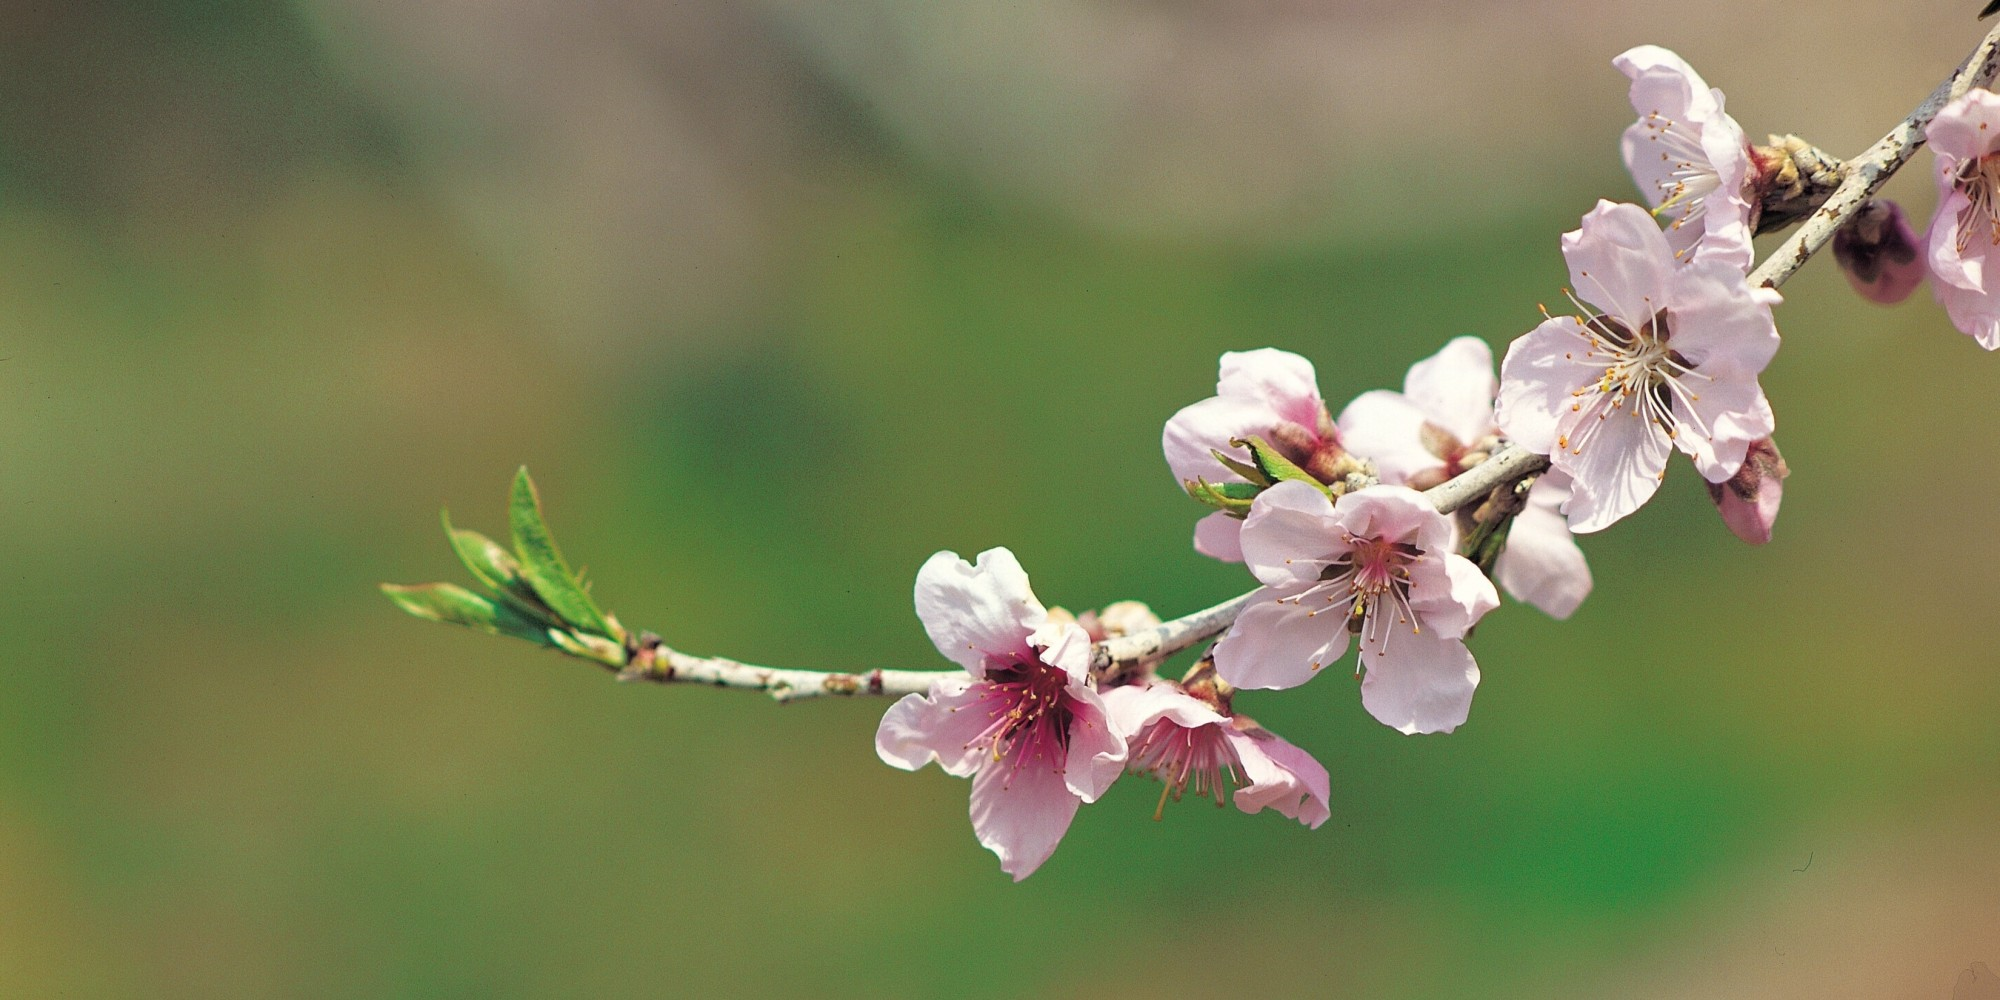 Asian teens cherry blossom virgins 6